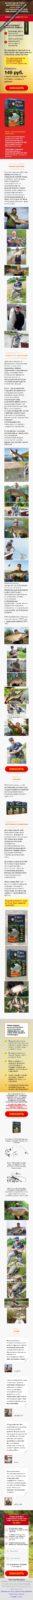 Скриншот Готового лендинга Стимулятор улова Fish Hunt 001 - моб